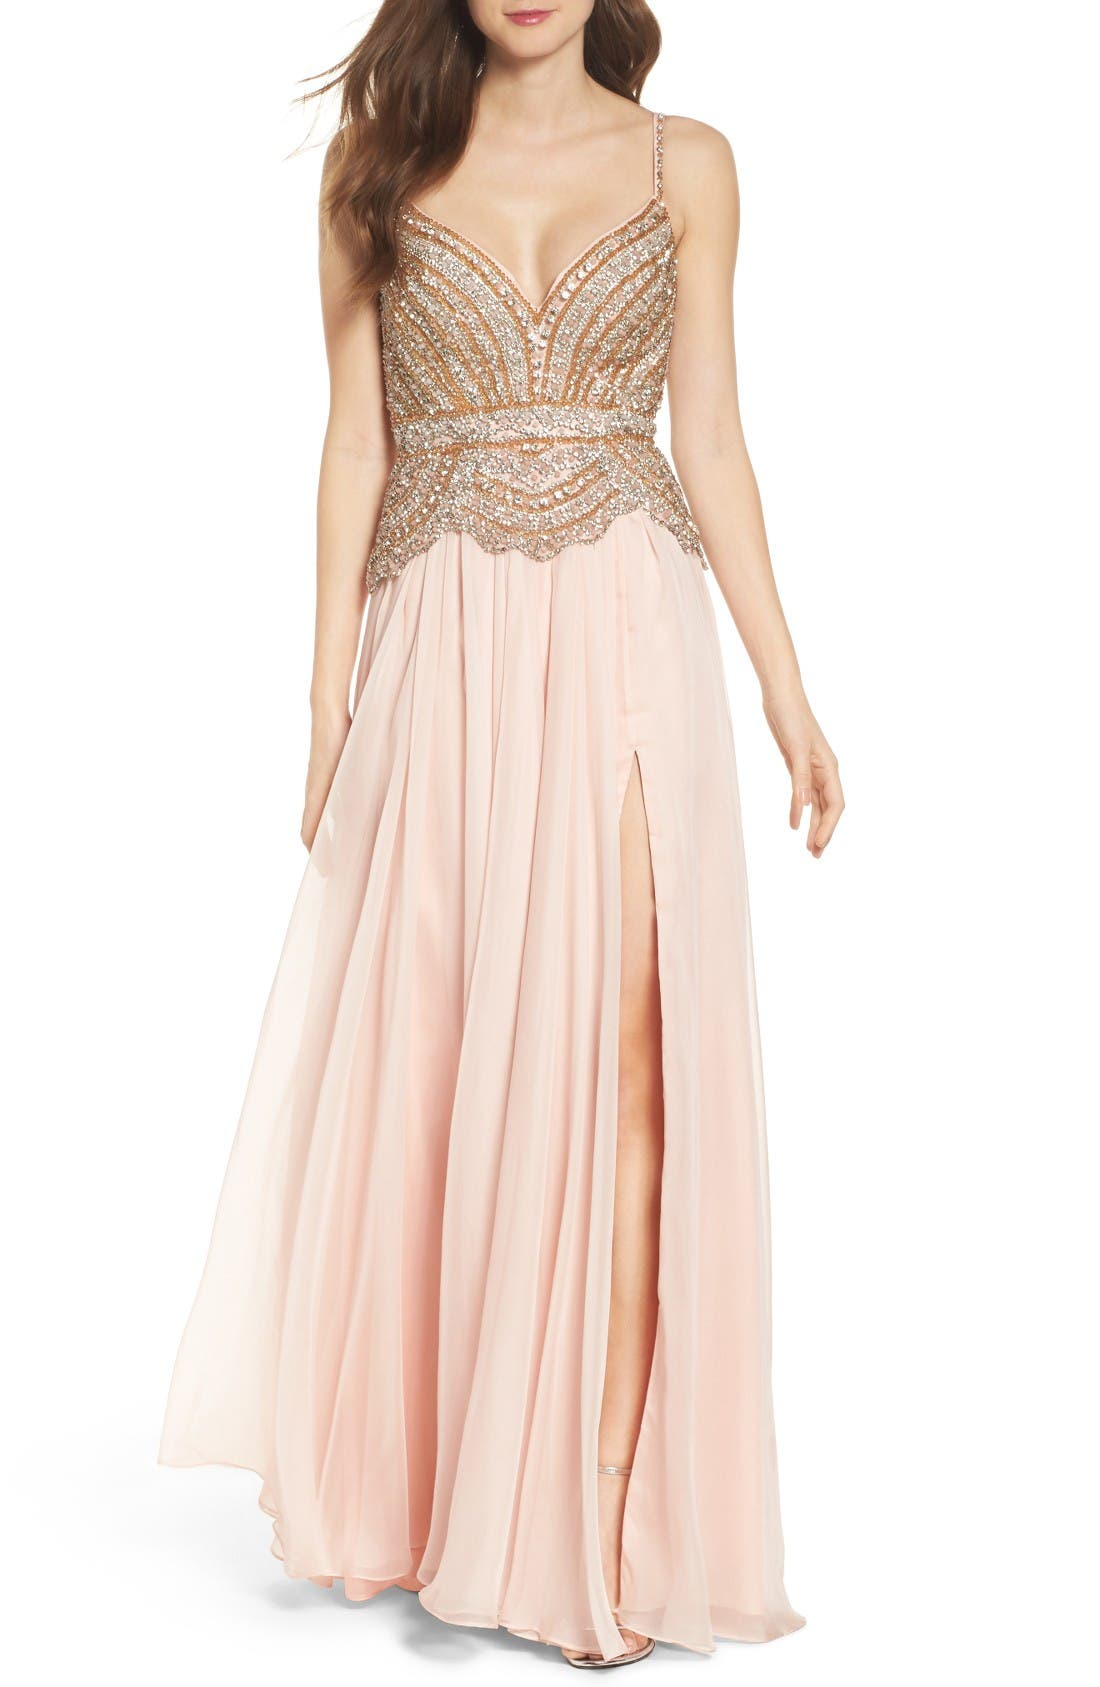 Alternate Image 1 Selected - Mac Duggal Rhinstone Bodice A-Line Chiffon Gown